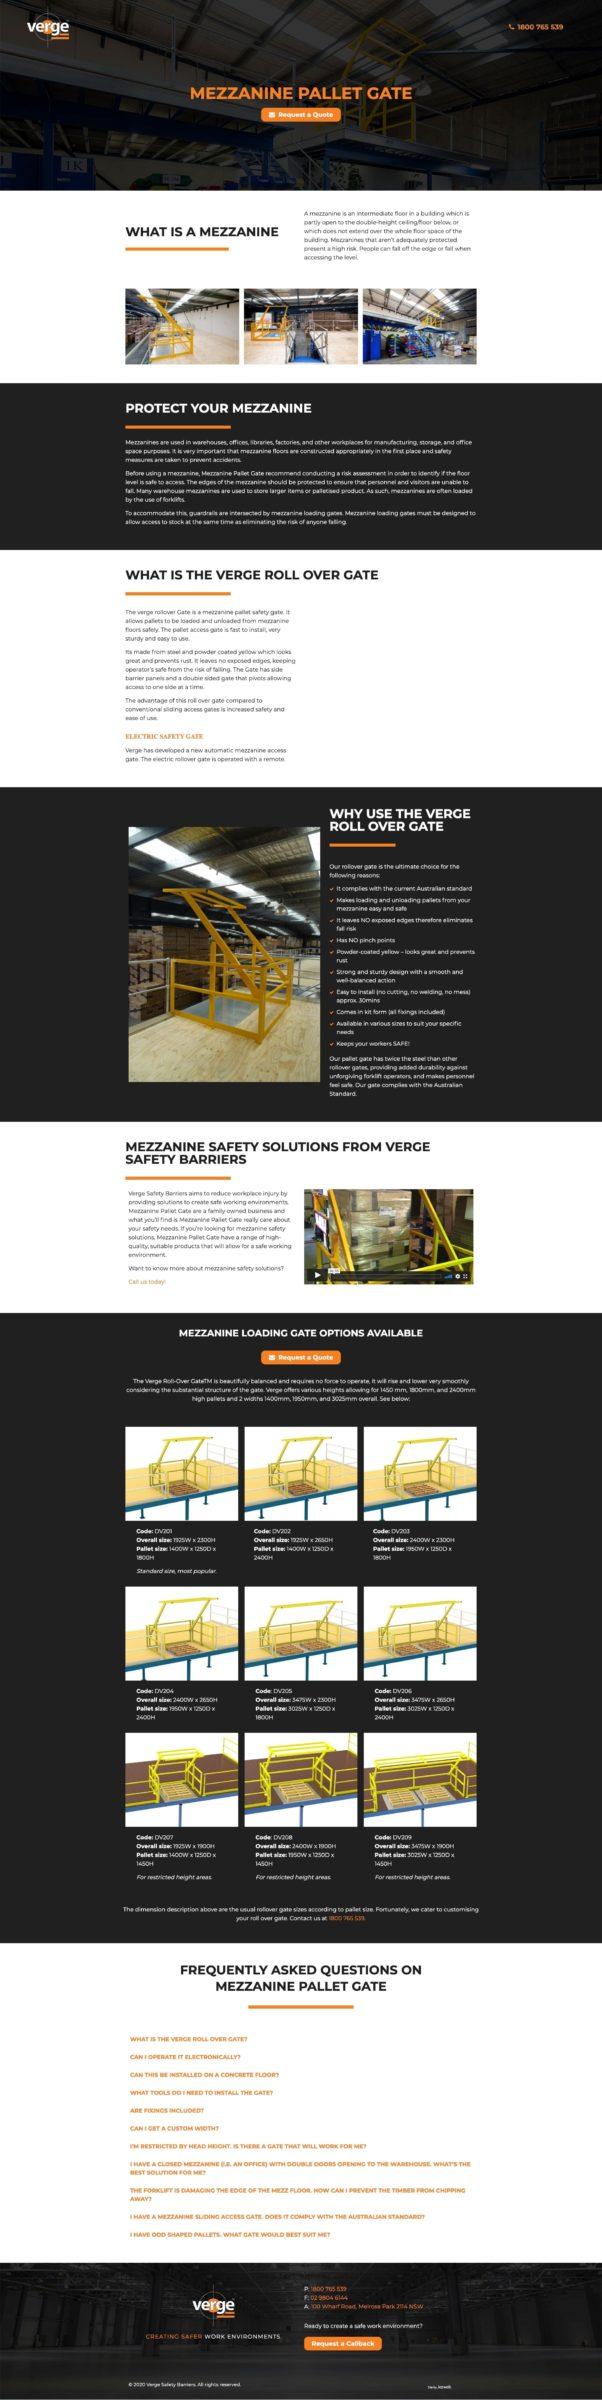 mezzanine pallet gate website